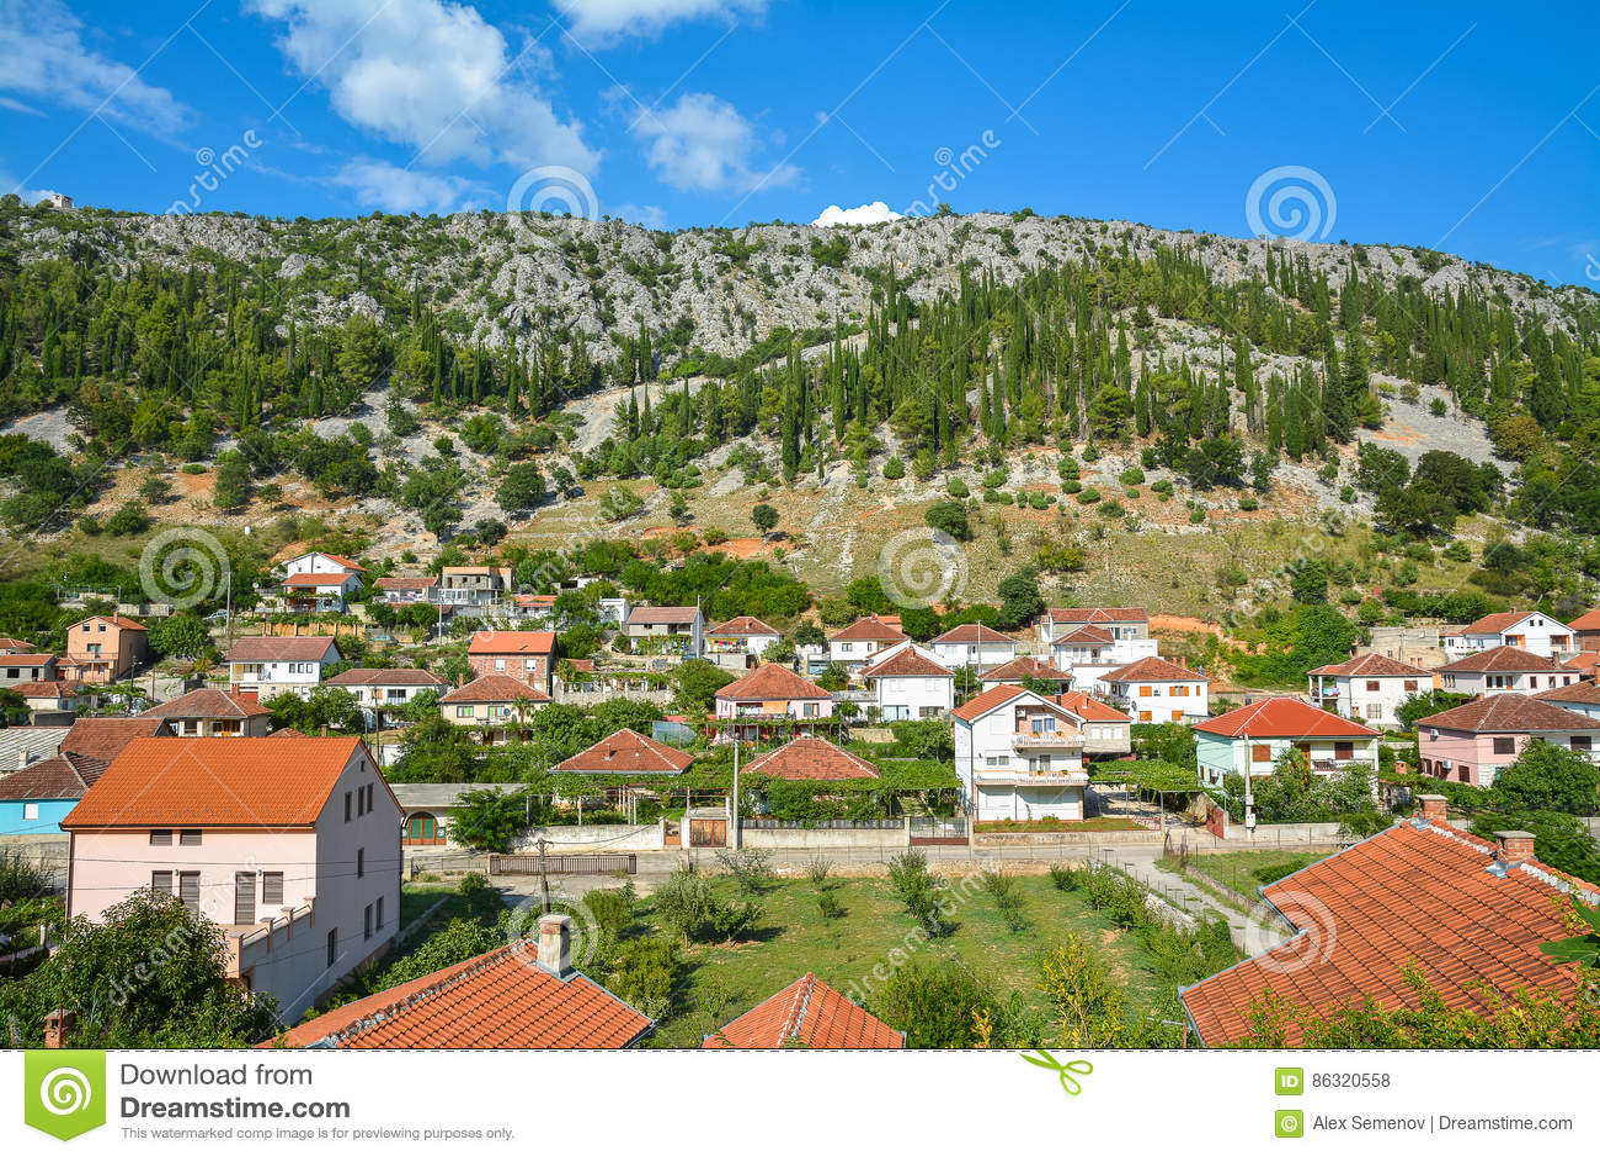 Neat Houses In The Small Town Trebinje, Bosnia And Herzegovina ...